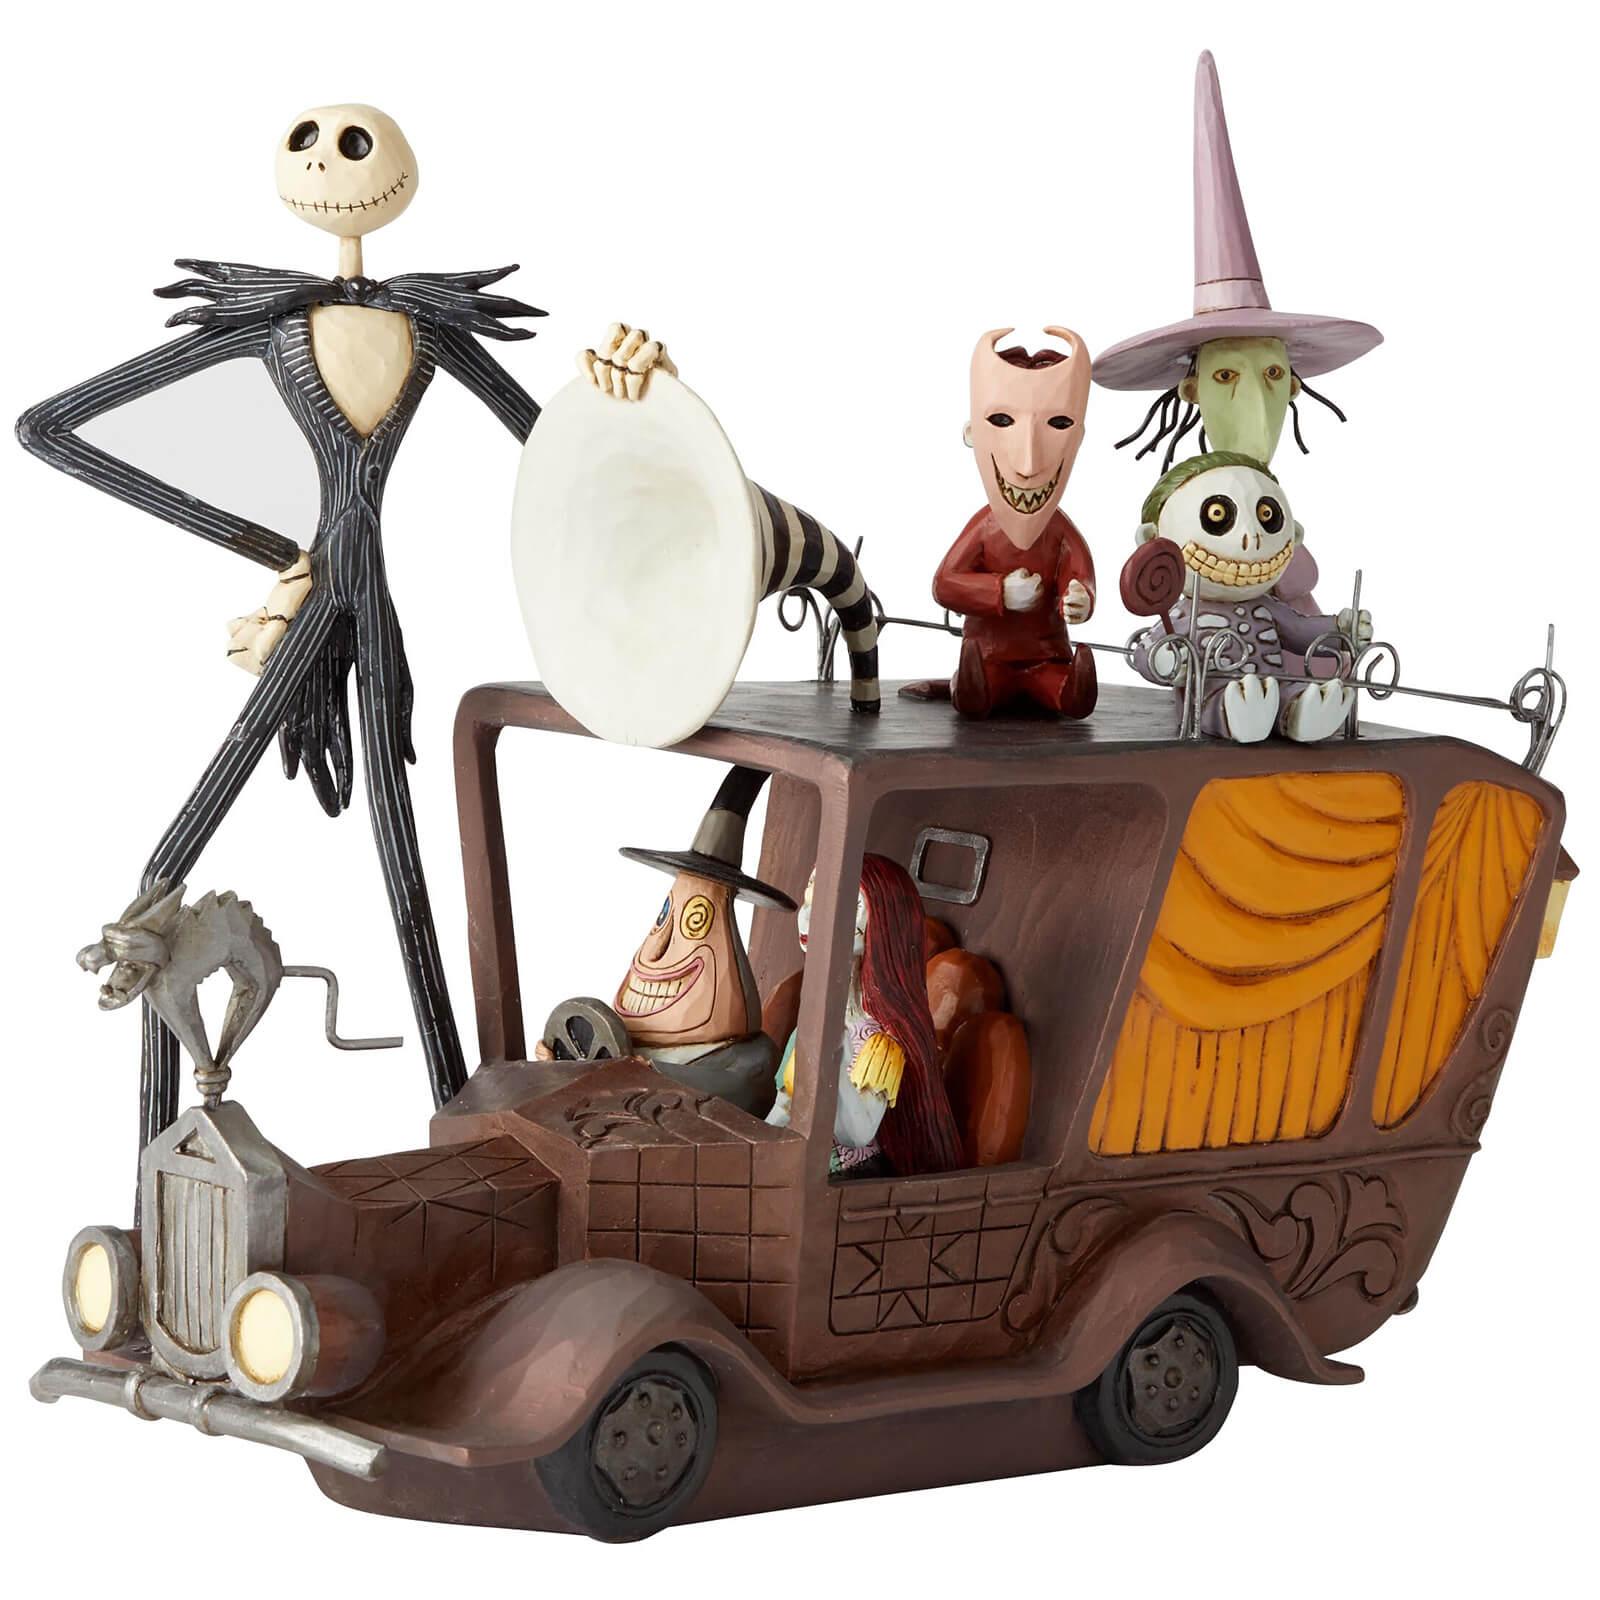 Image of Enesco Disney Showcase Collection Statue Mayor Car (Nightmare Before Christmas) 17 cm